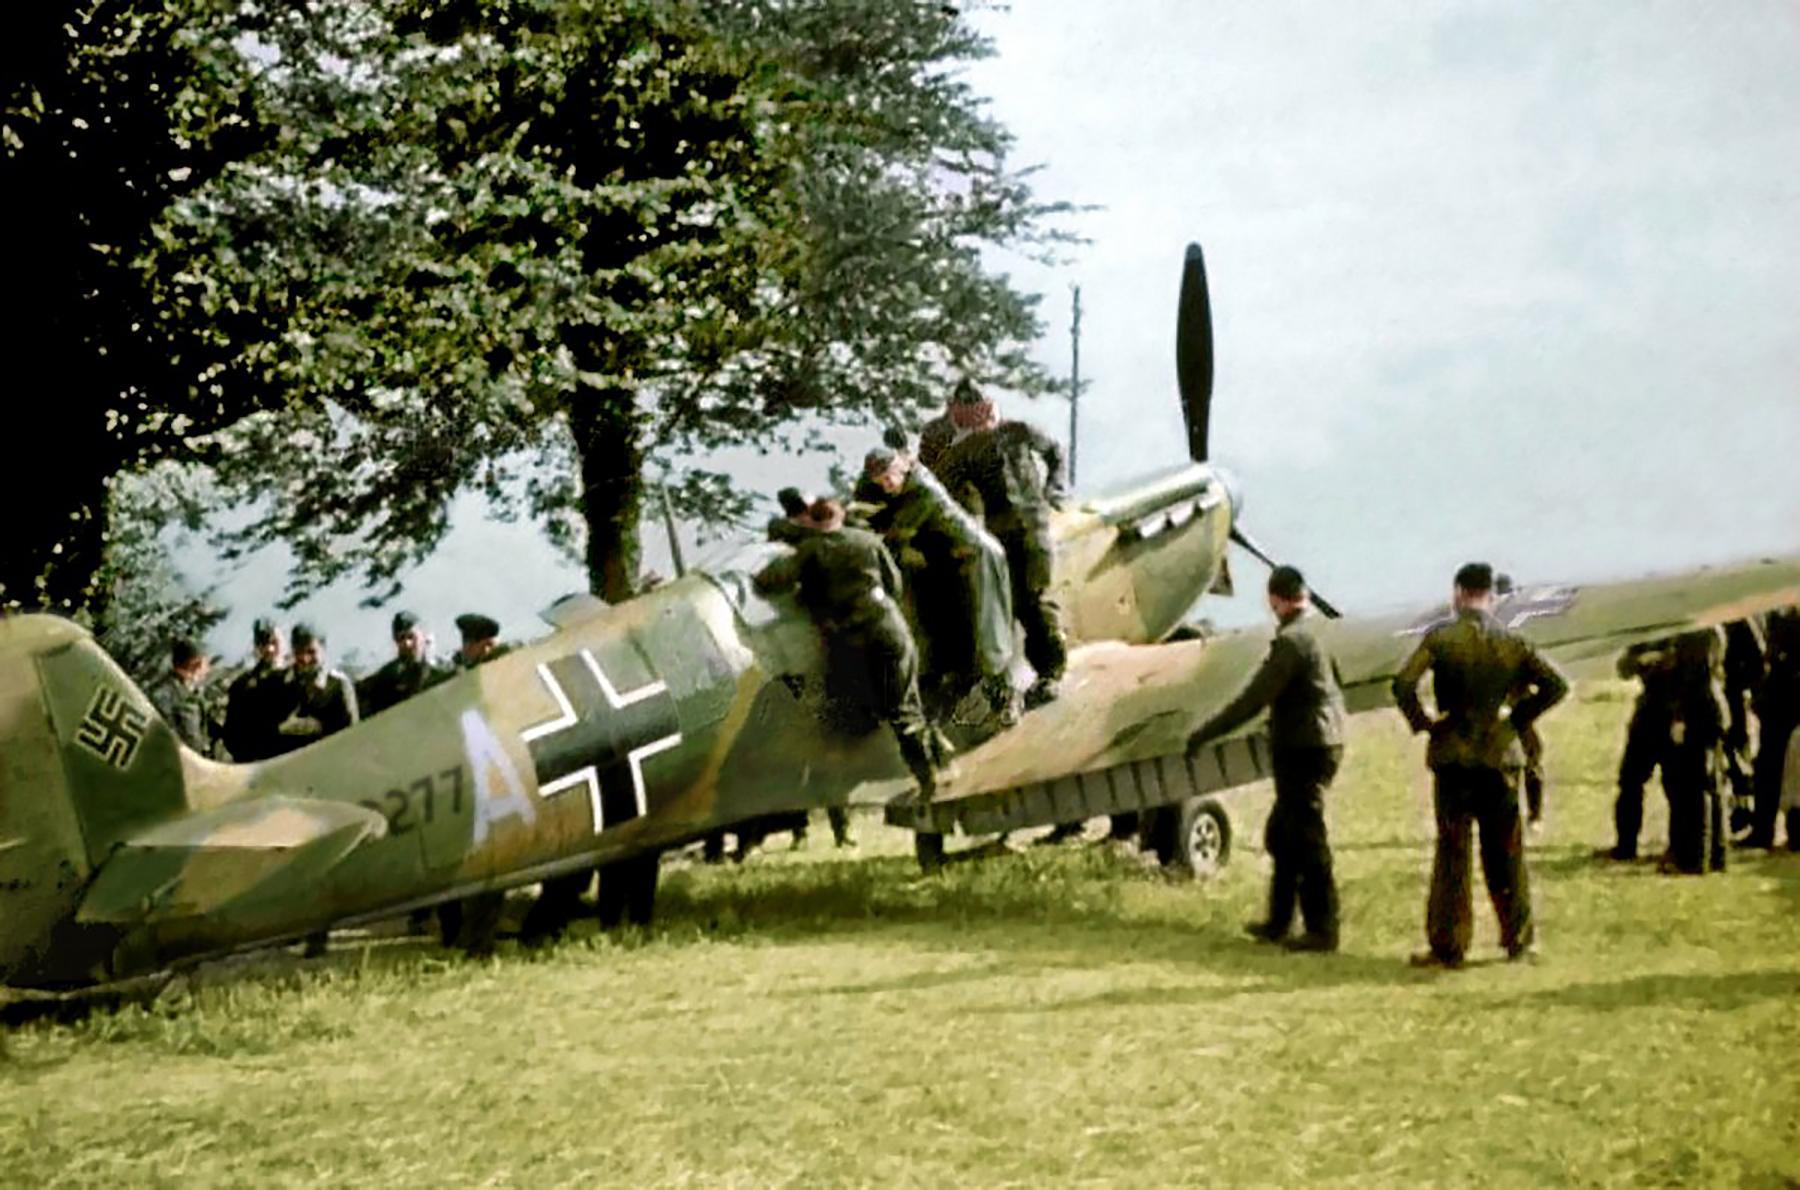 Spitfire MkIa RAF 234Sqn AZH Richard Hardy N3277 forced landed Cherbourg France Aug 15 1940 06